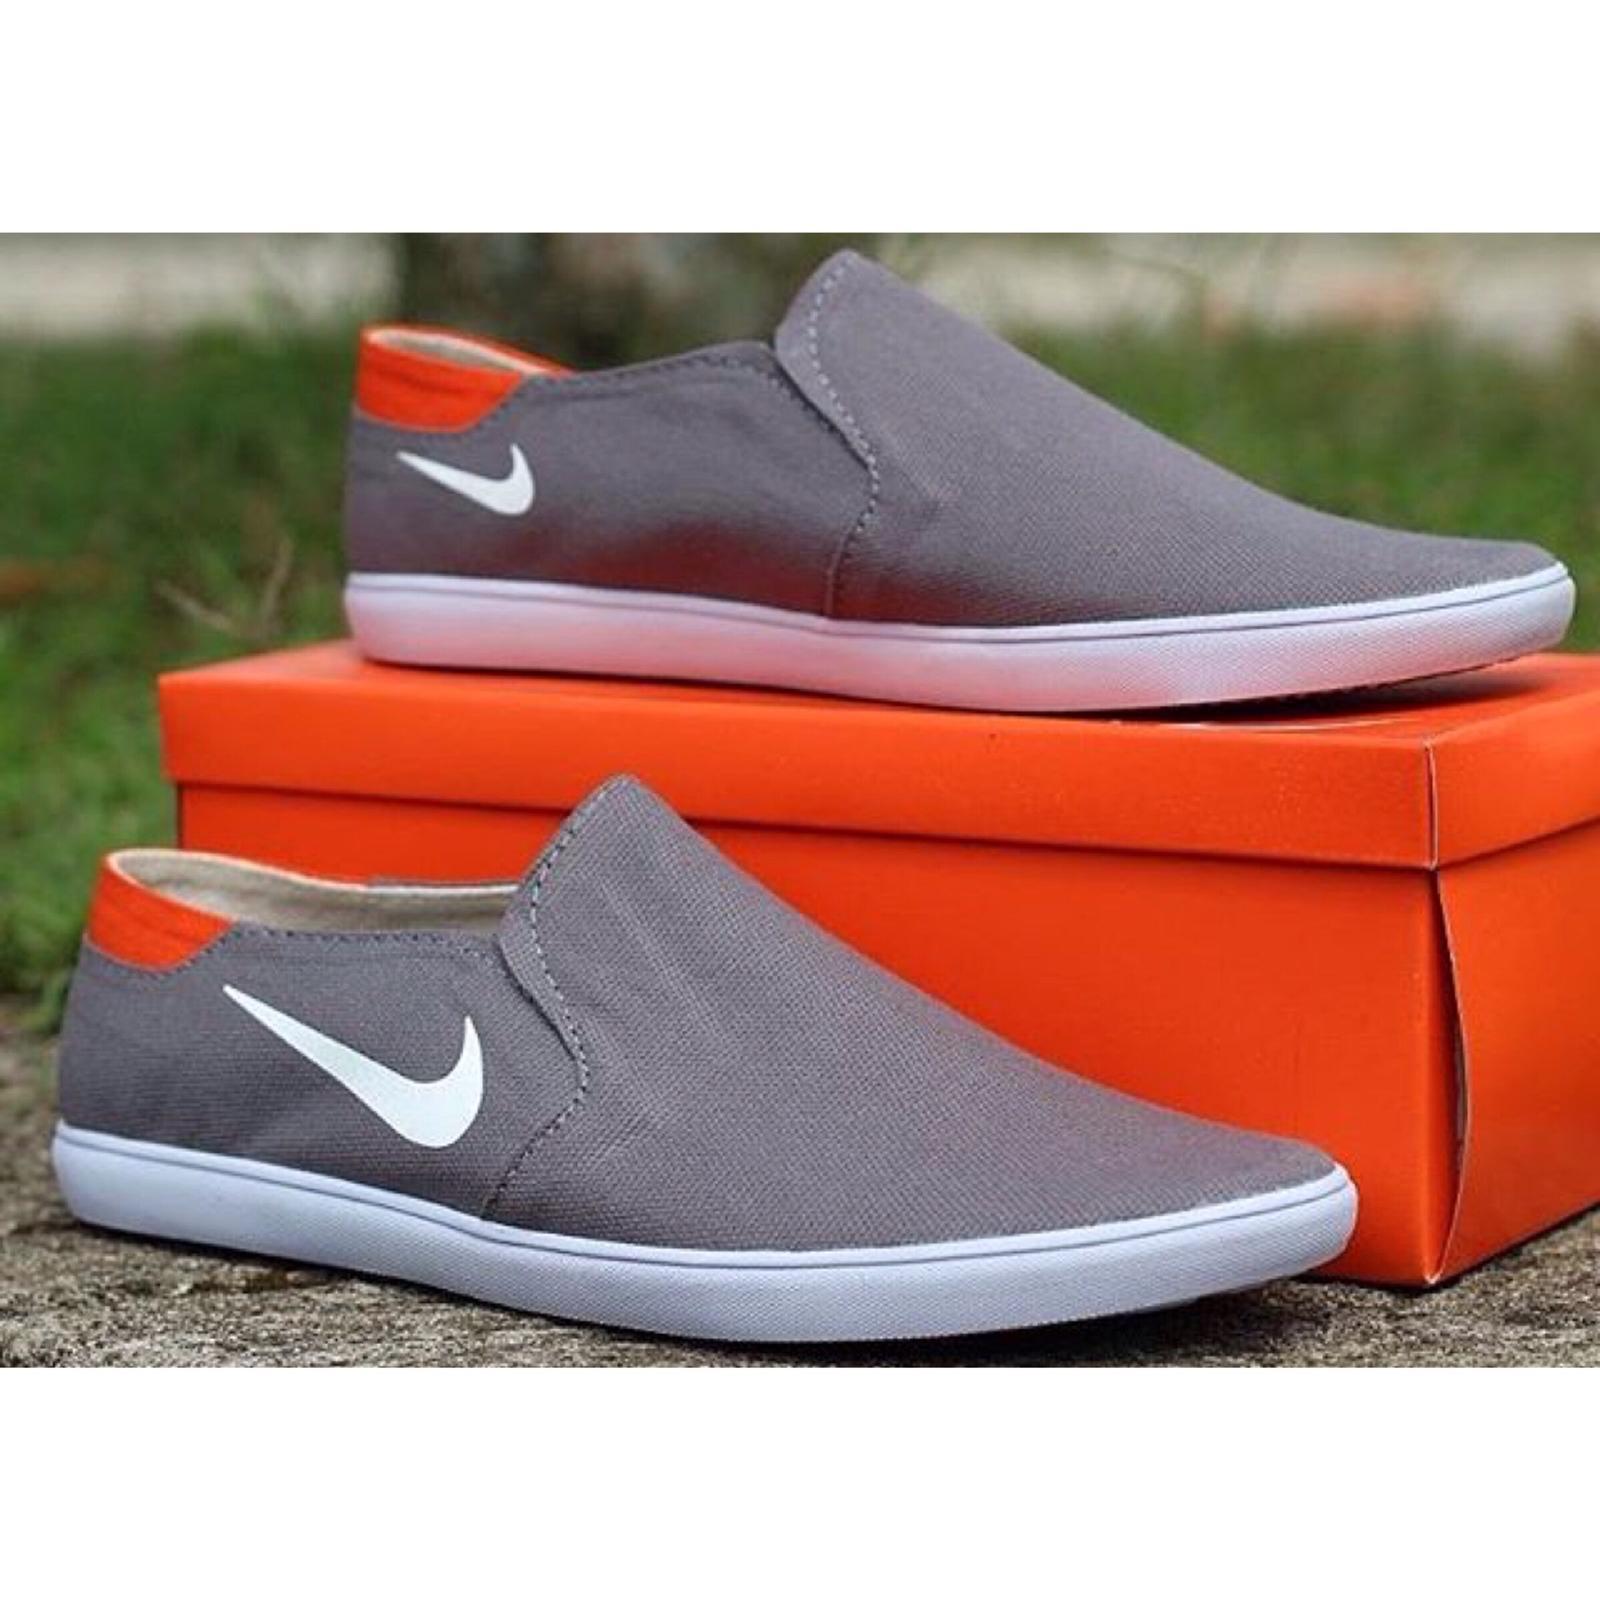 Cek Harga Baru Jual Off White Sepatu Sneakers Slip On Nike Fresto ... 57bedc7deb